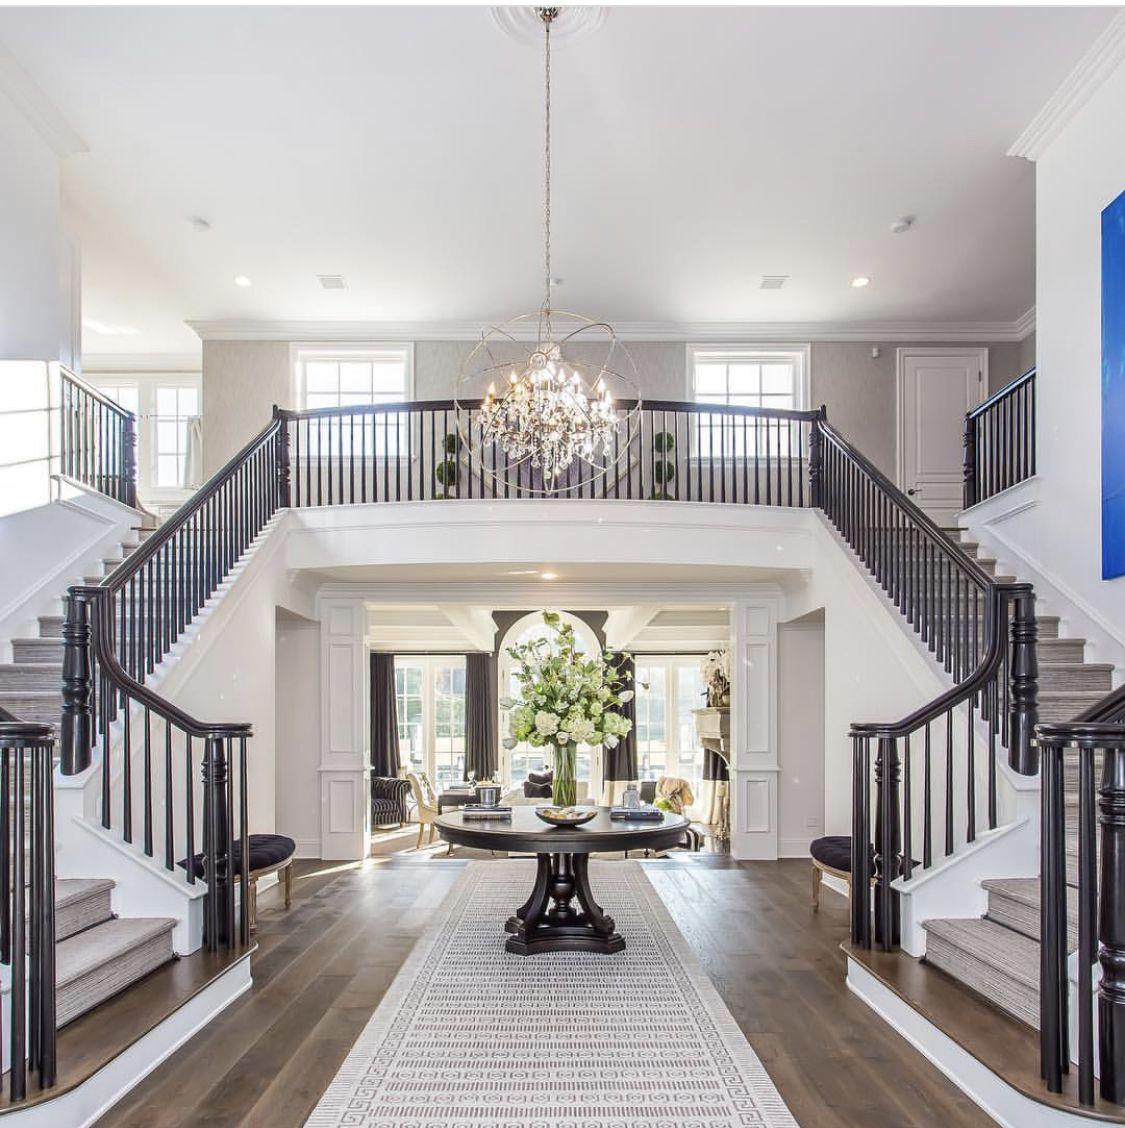 Pin By J Nos On Dream House Dream Home Design House Dream